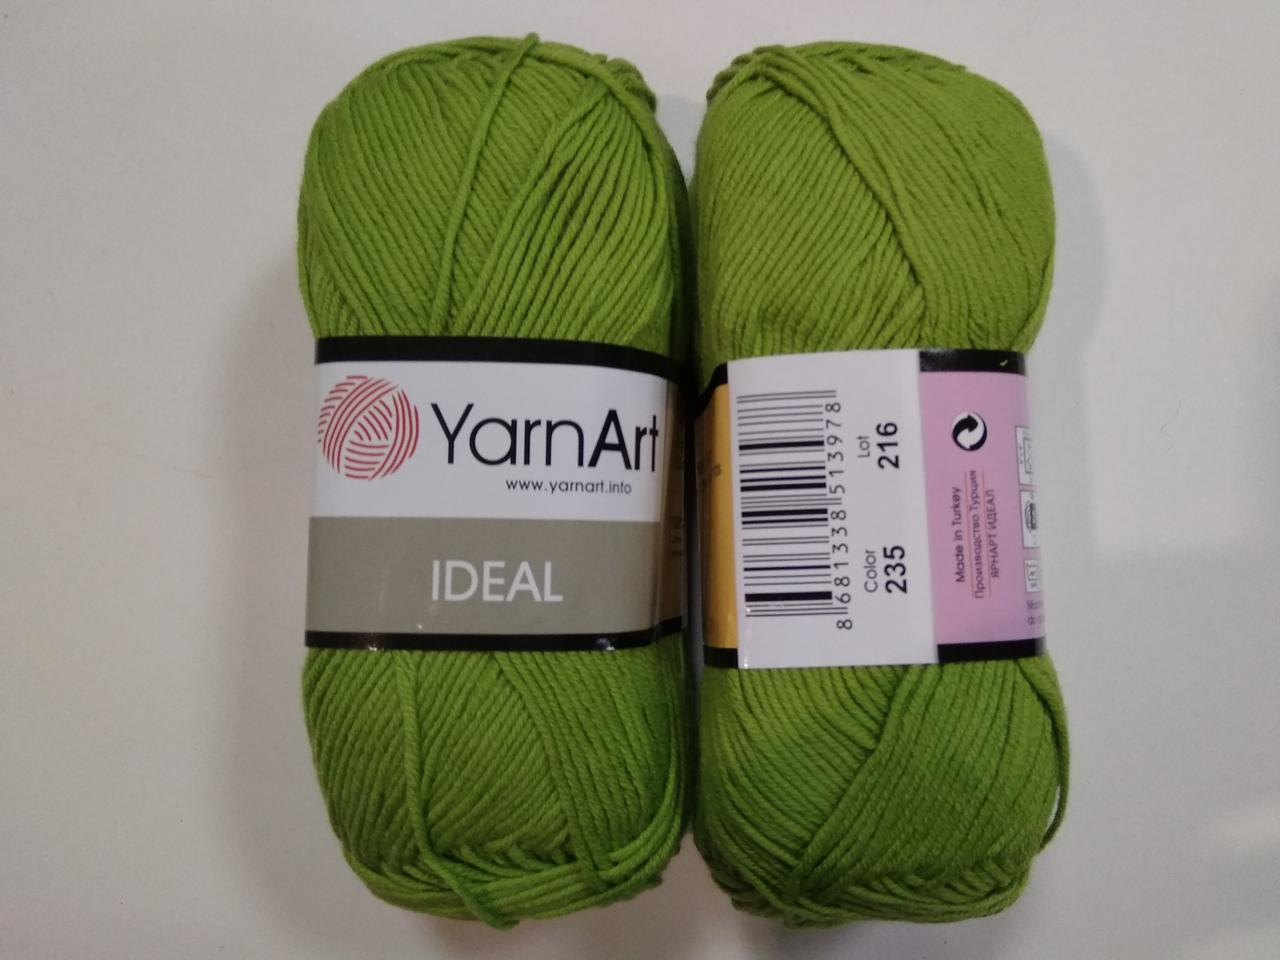 Пряжа Идеал  (Ideal) Yarn Art цвет 235 зеленый